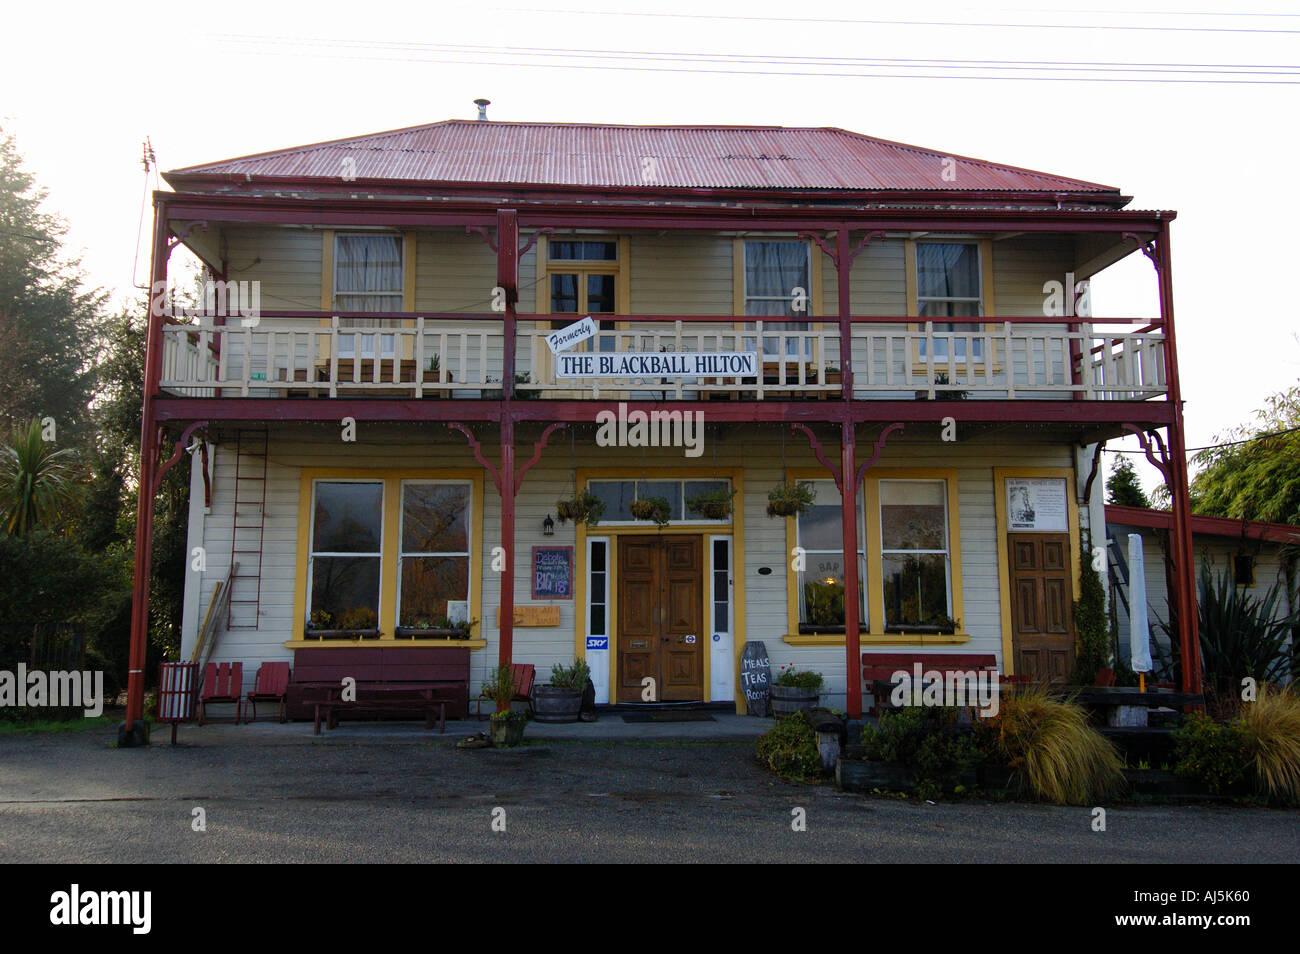 New Zealand South Island Blackball Hilton Hotel - Stock Image